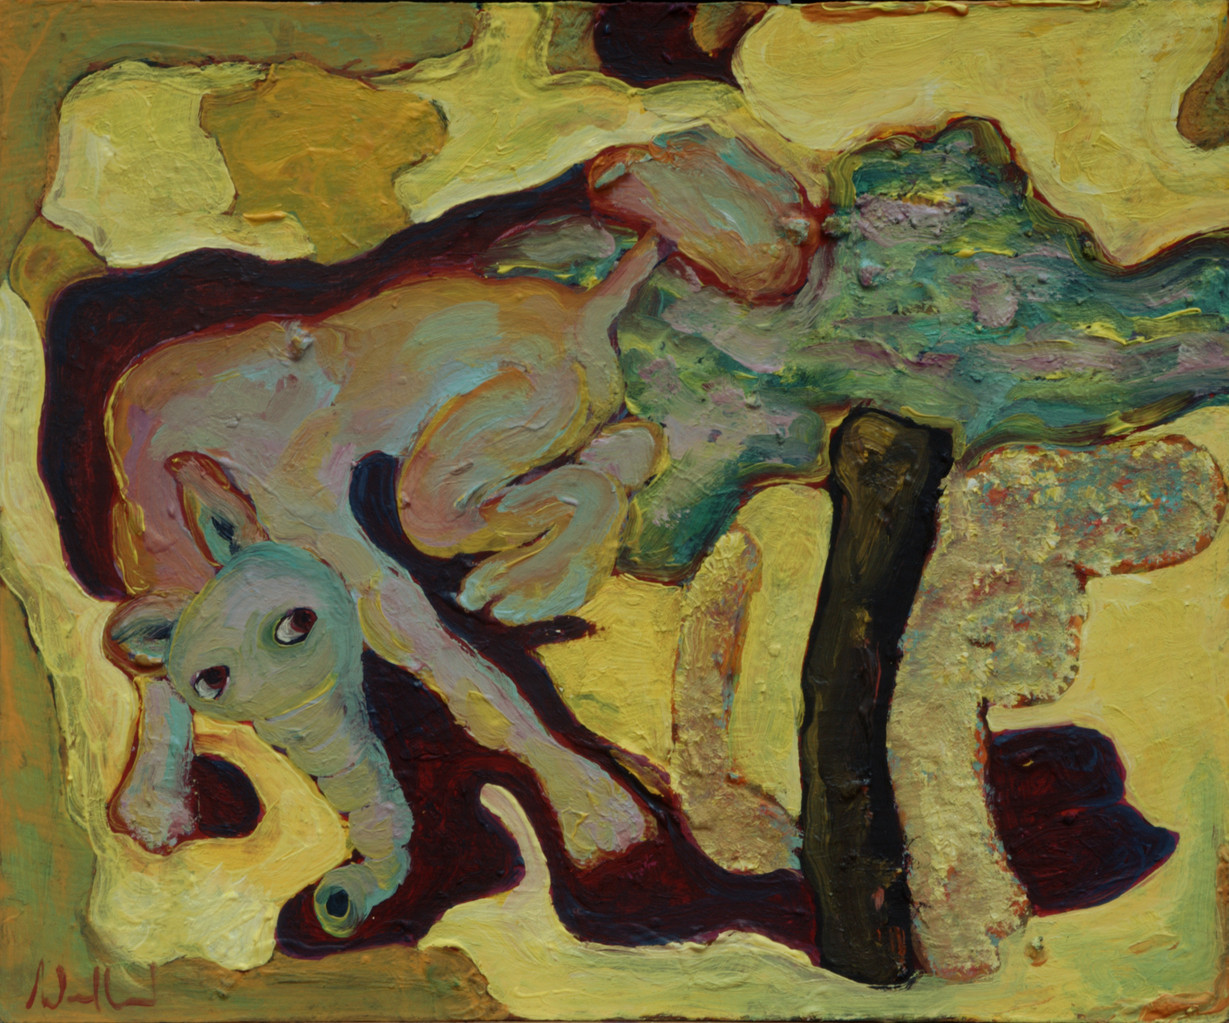 Elefantenpudel · 2013, Acryl, Öl auf Pappe, 16 x 19 cm